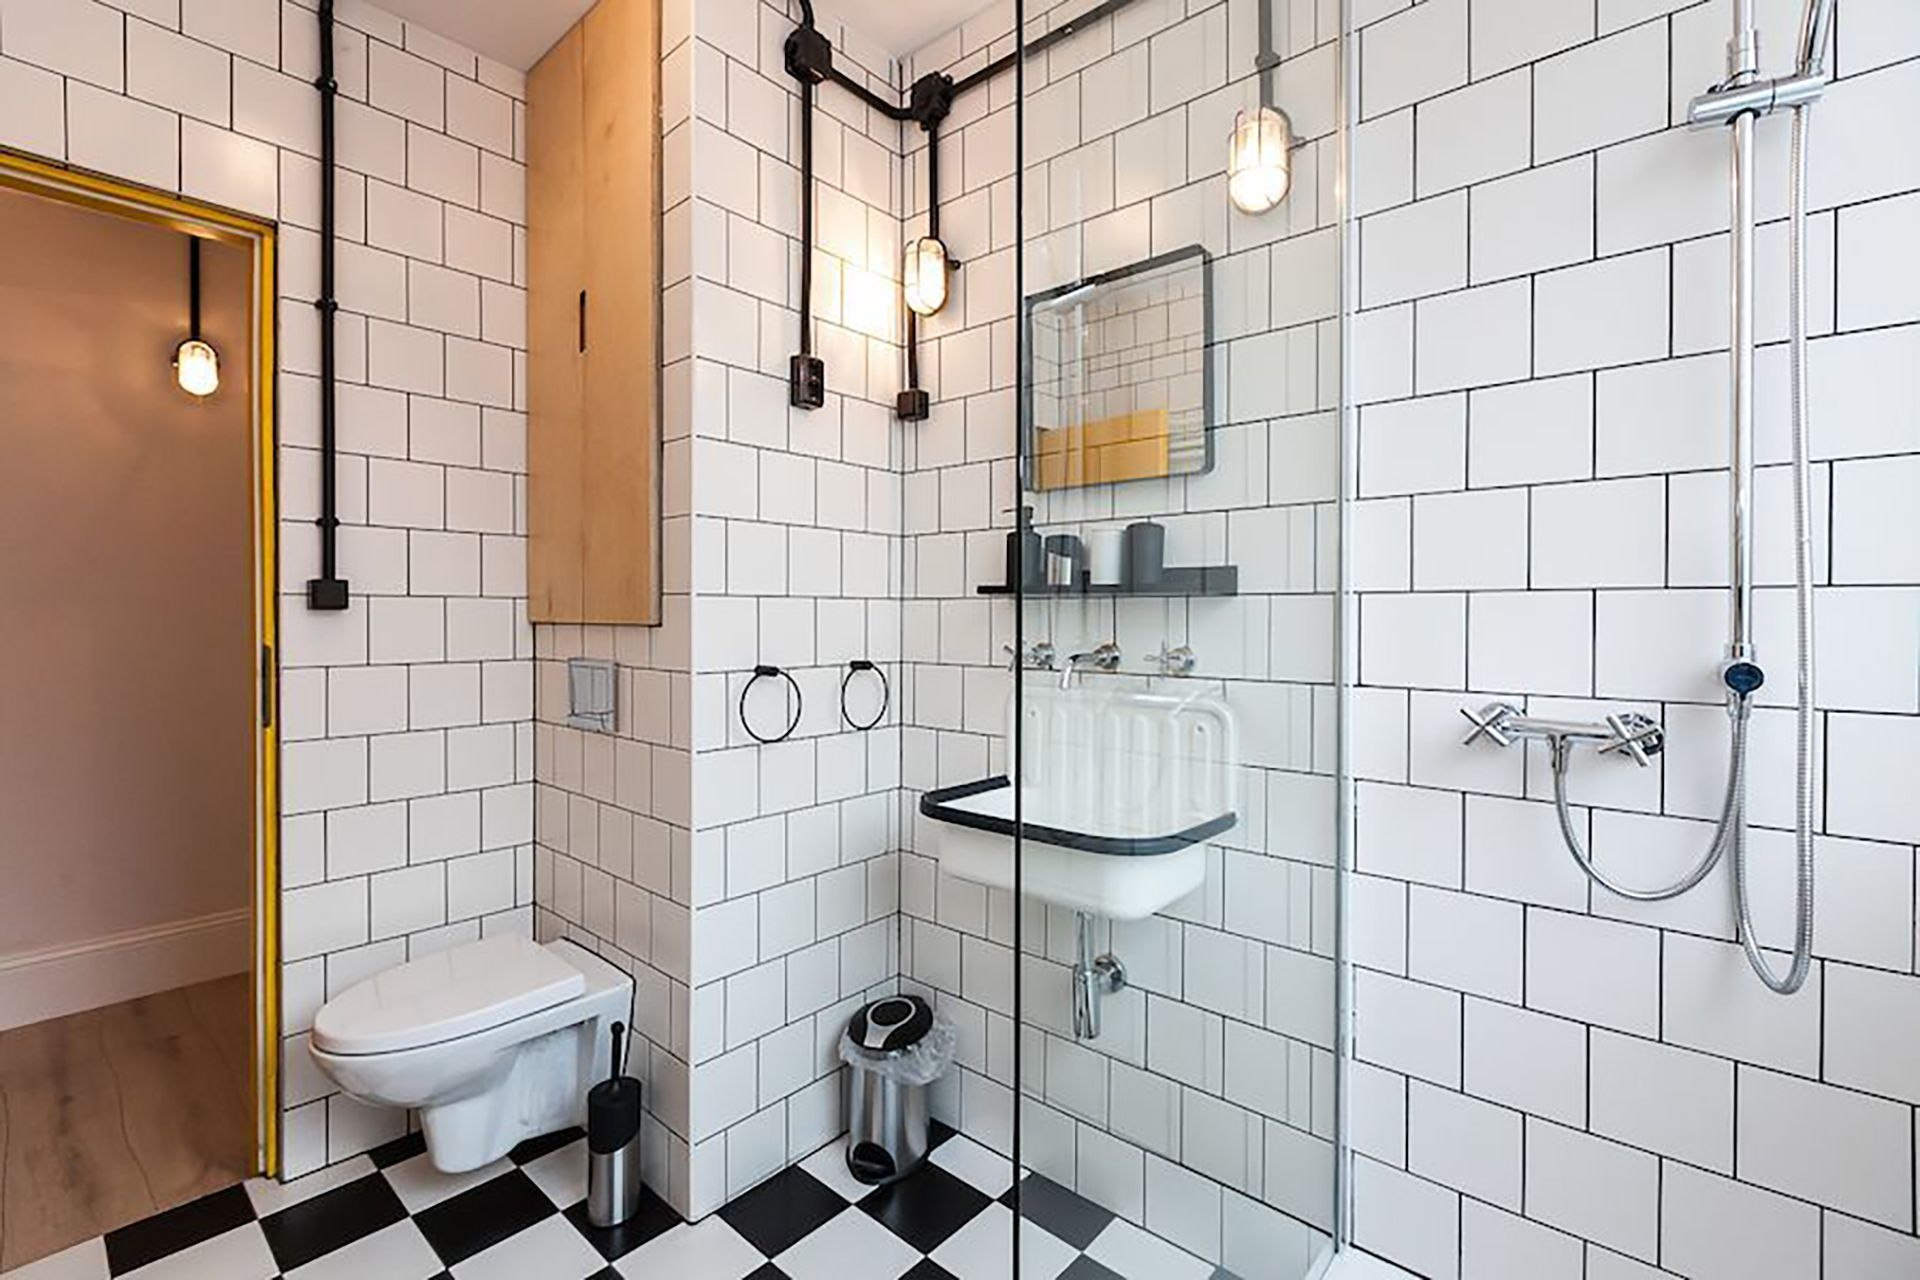 Private Room - Medium apartment to rent in Berlin BILE-LE96-1061-1